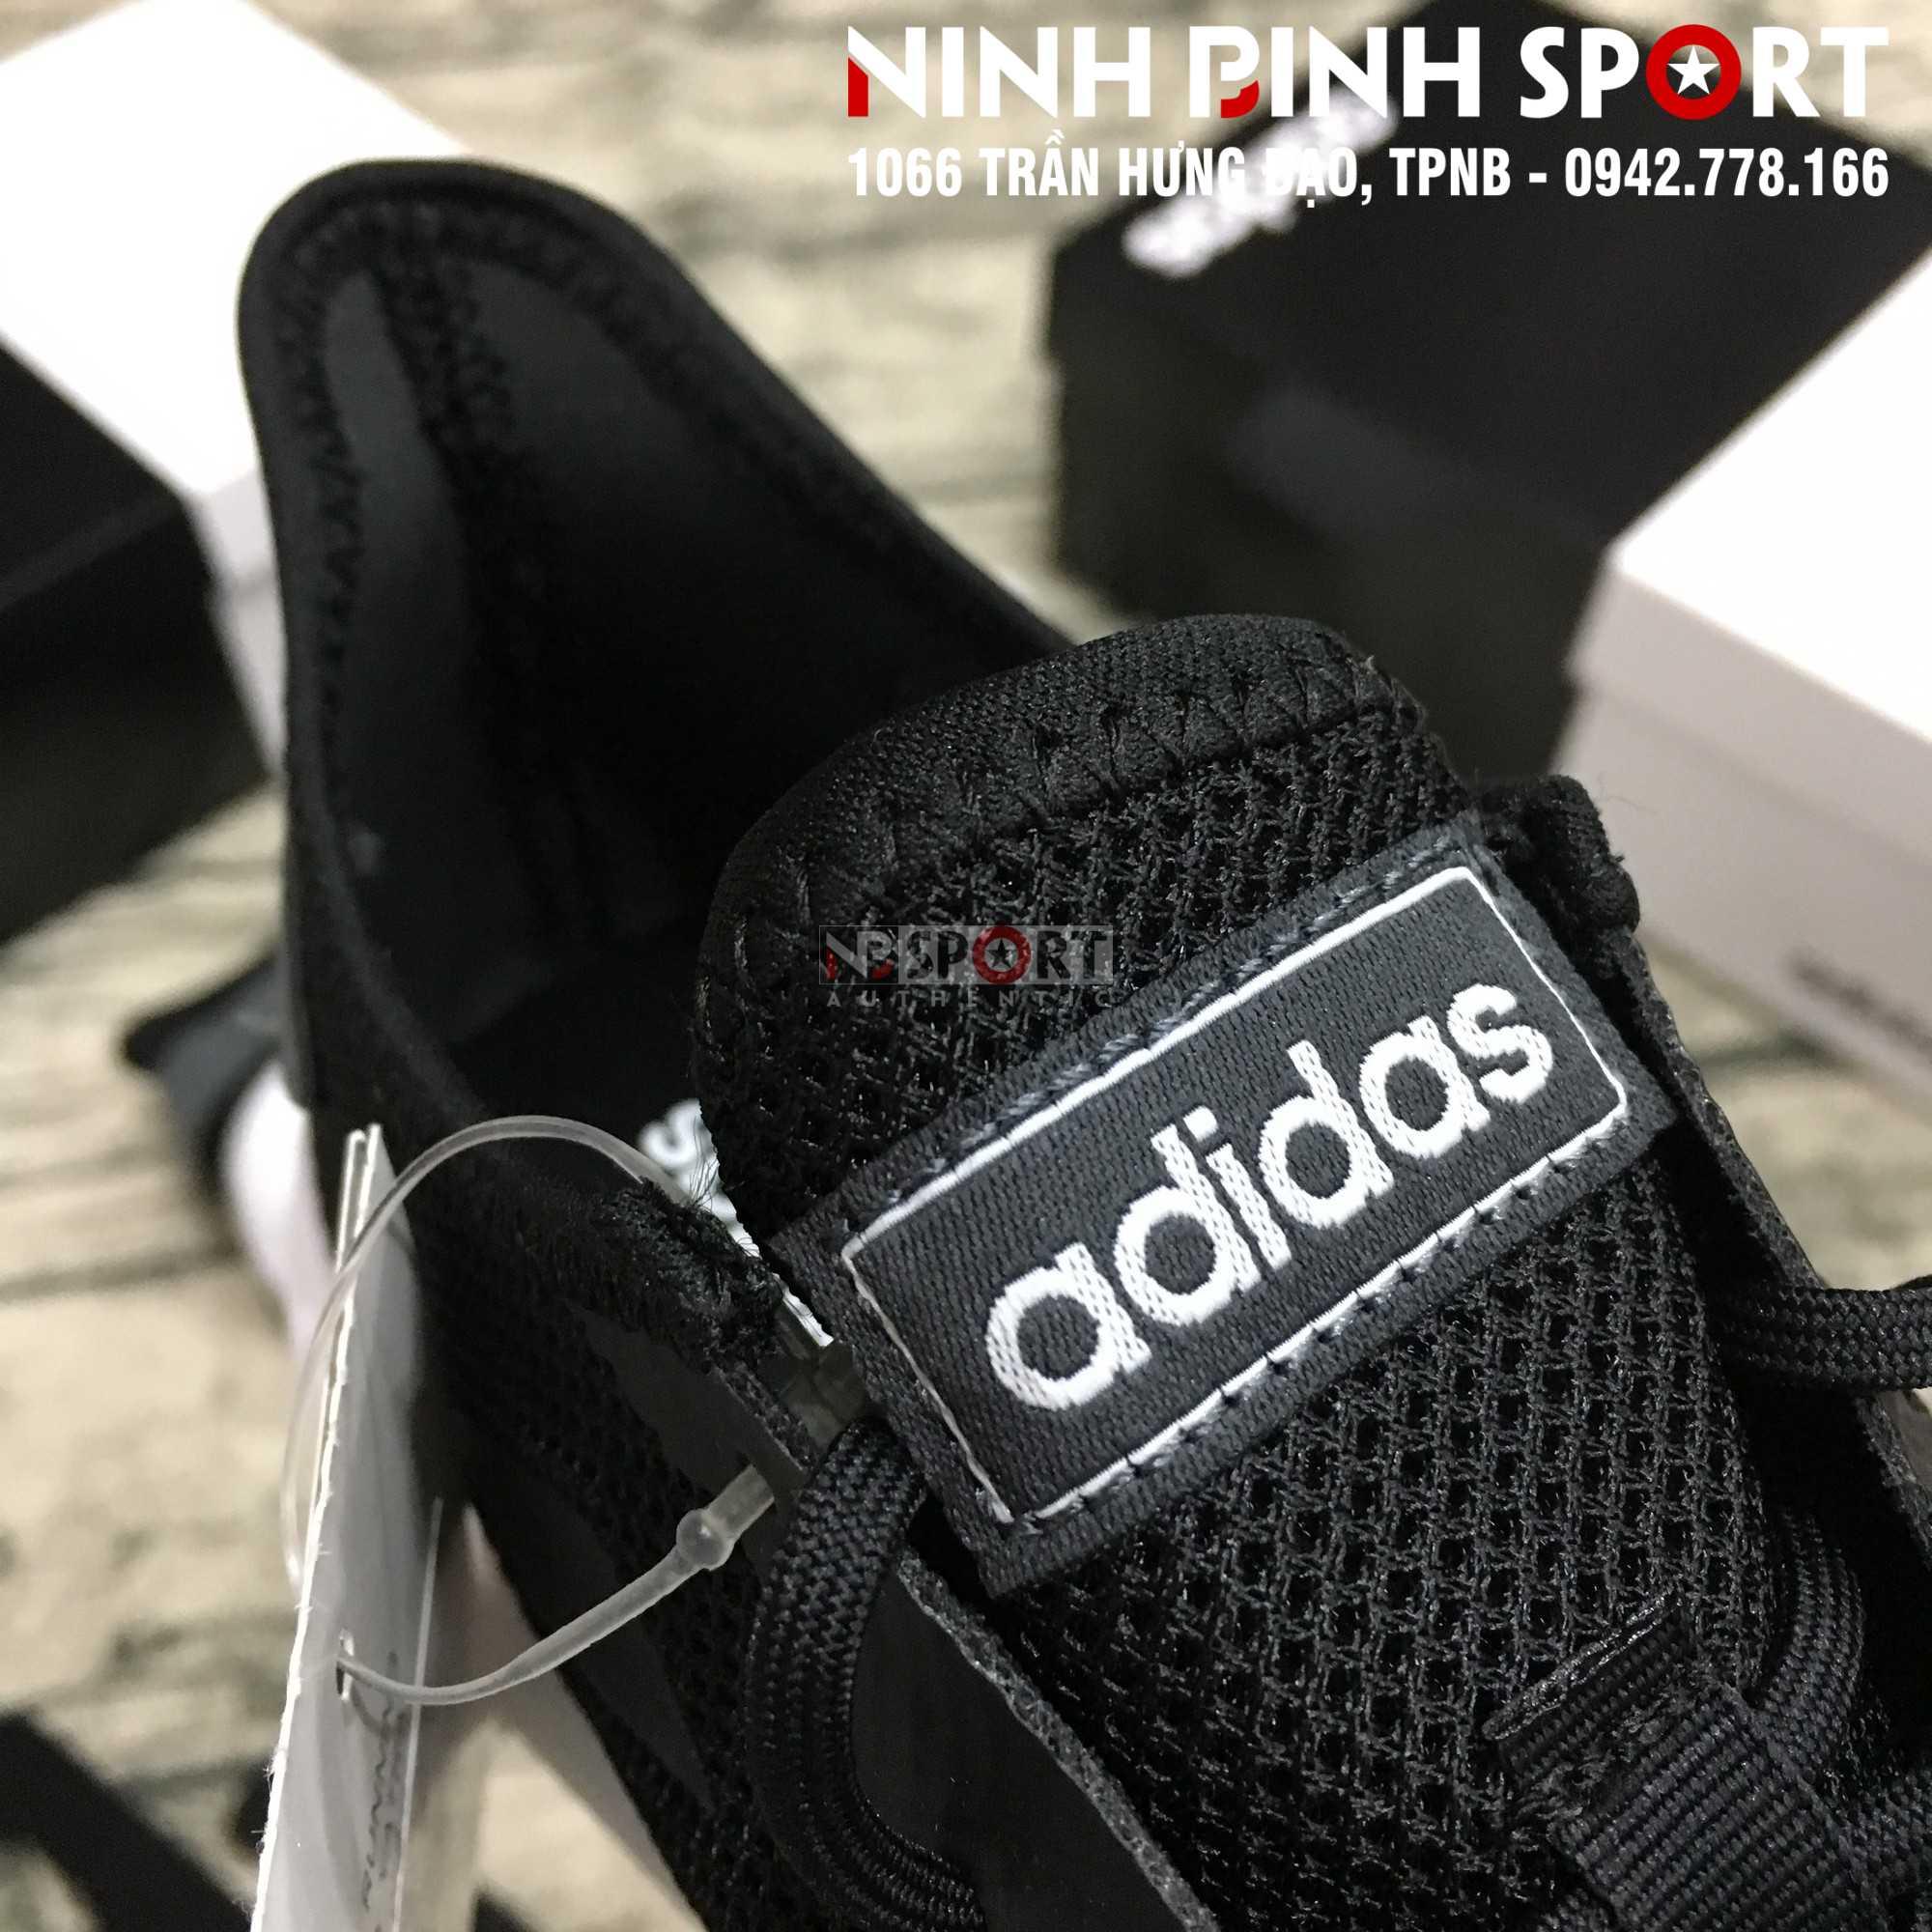 Giày thể thao nữ Adidas Yatra F36517